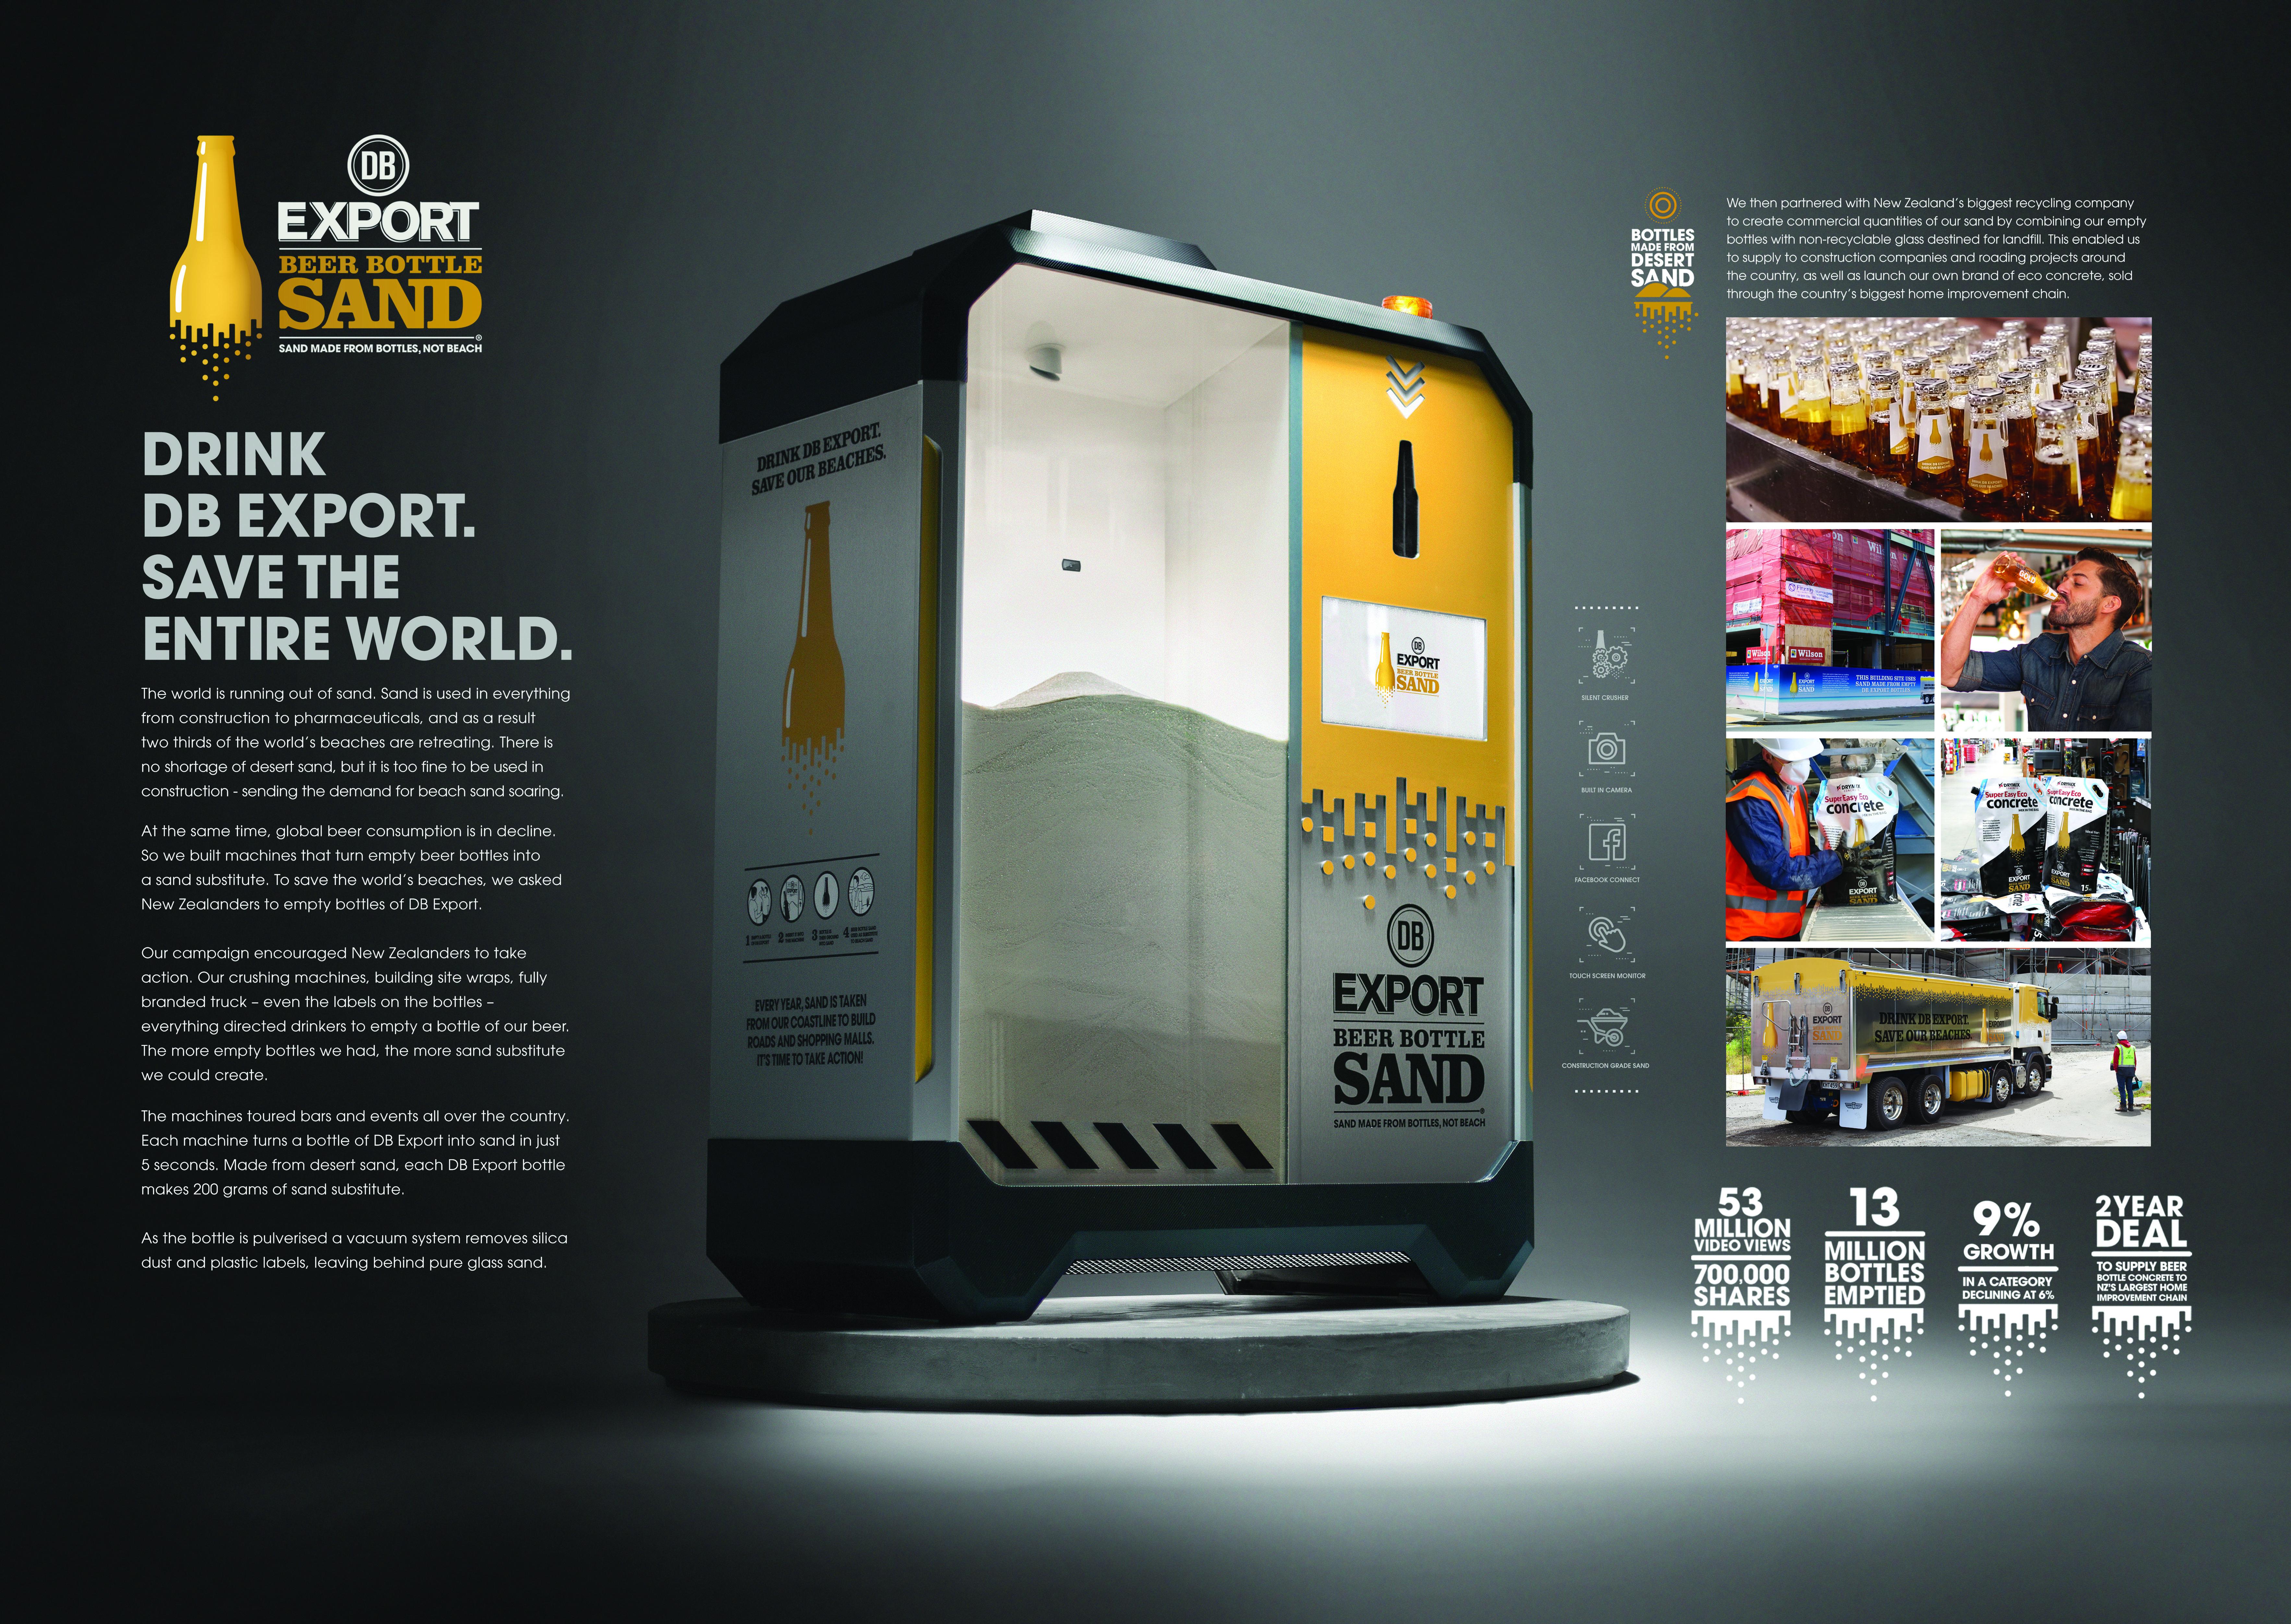 DB Export Beer Bottle Sand Thumbnail